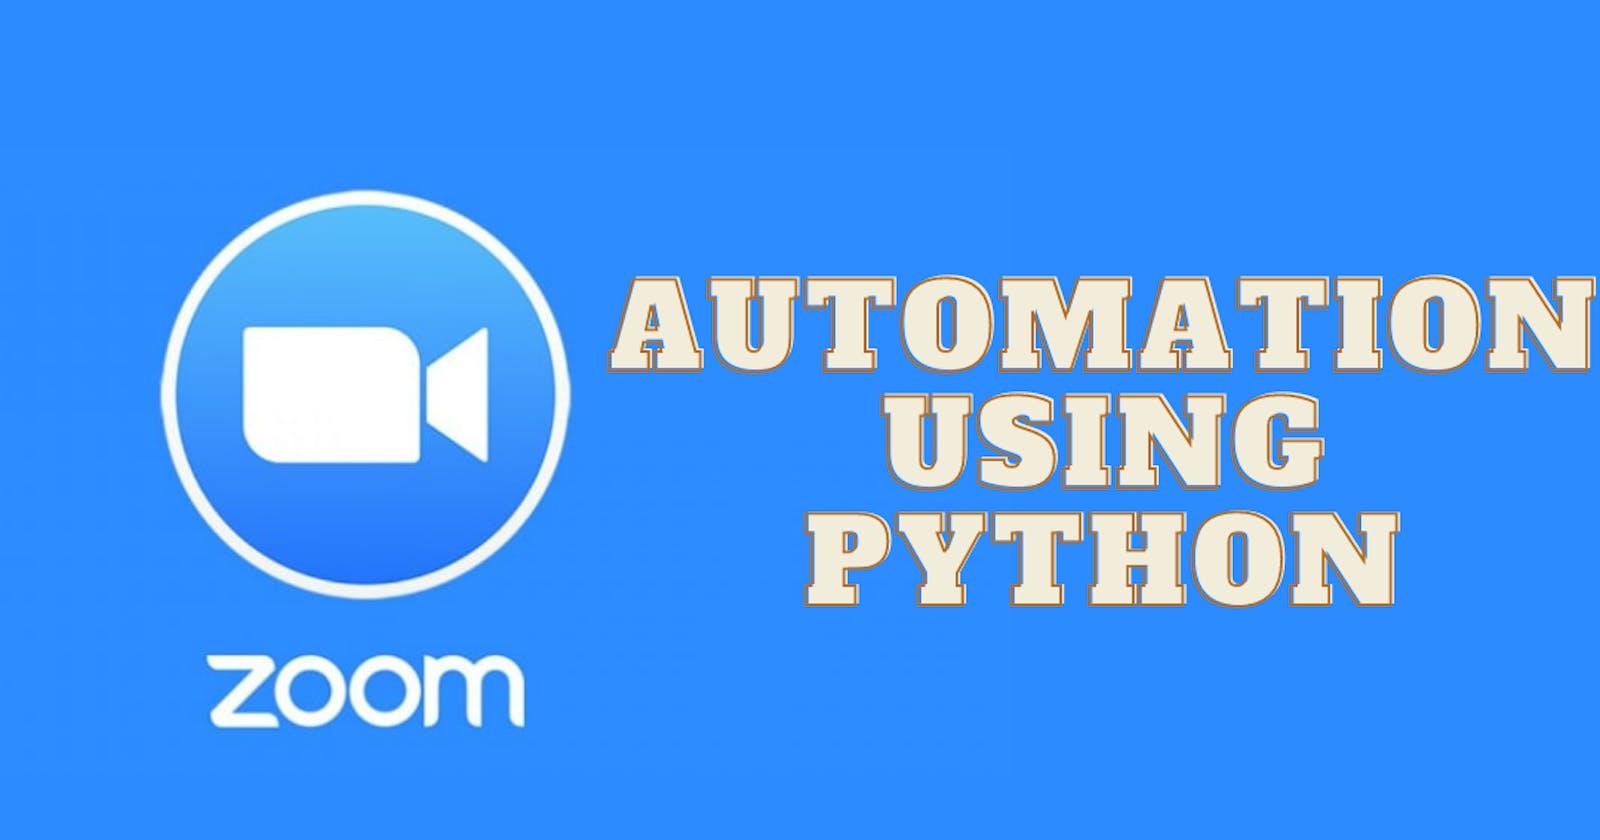 Zoom Automation Using Python